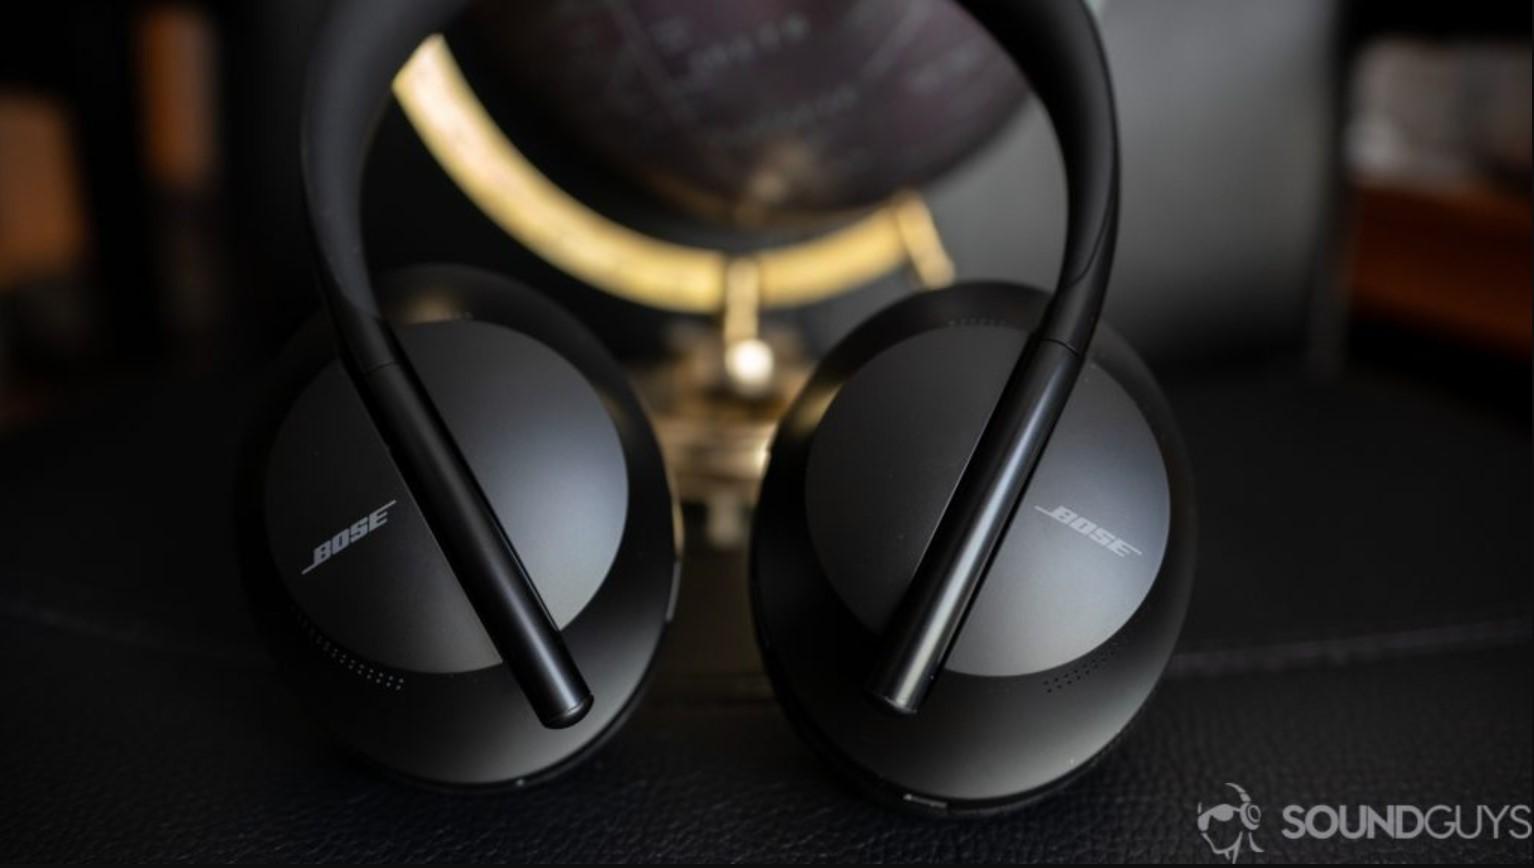 bose headphones 700 flattened